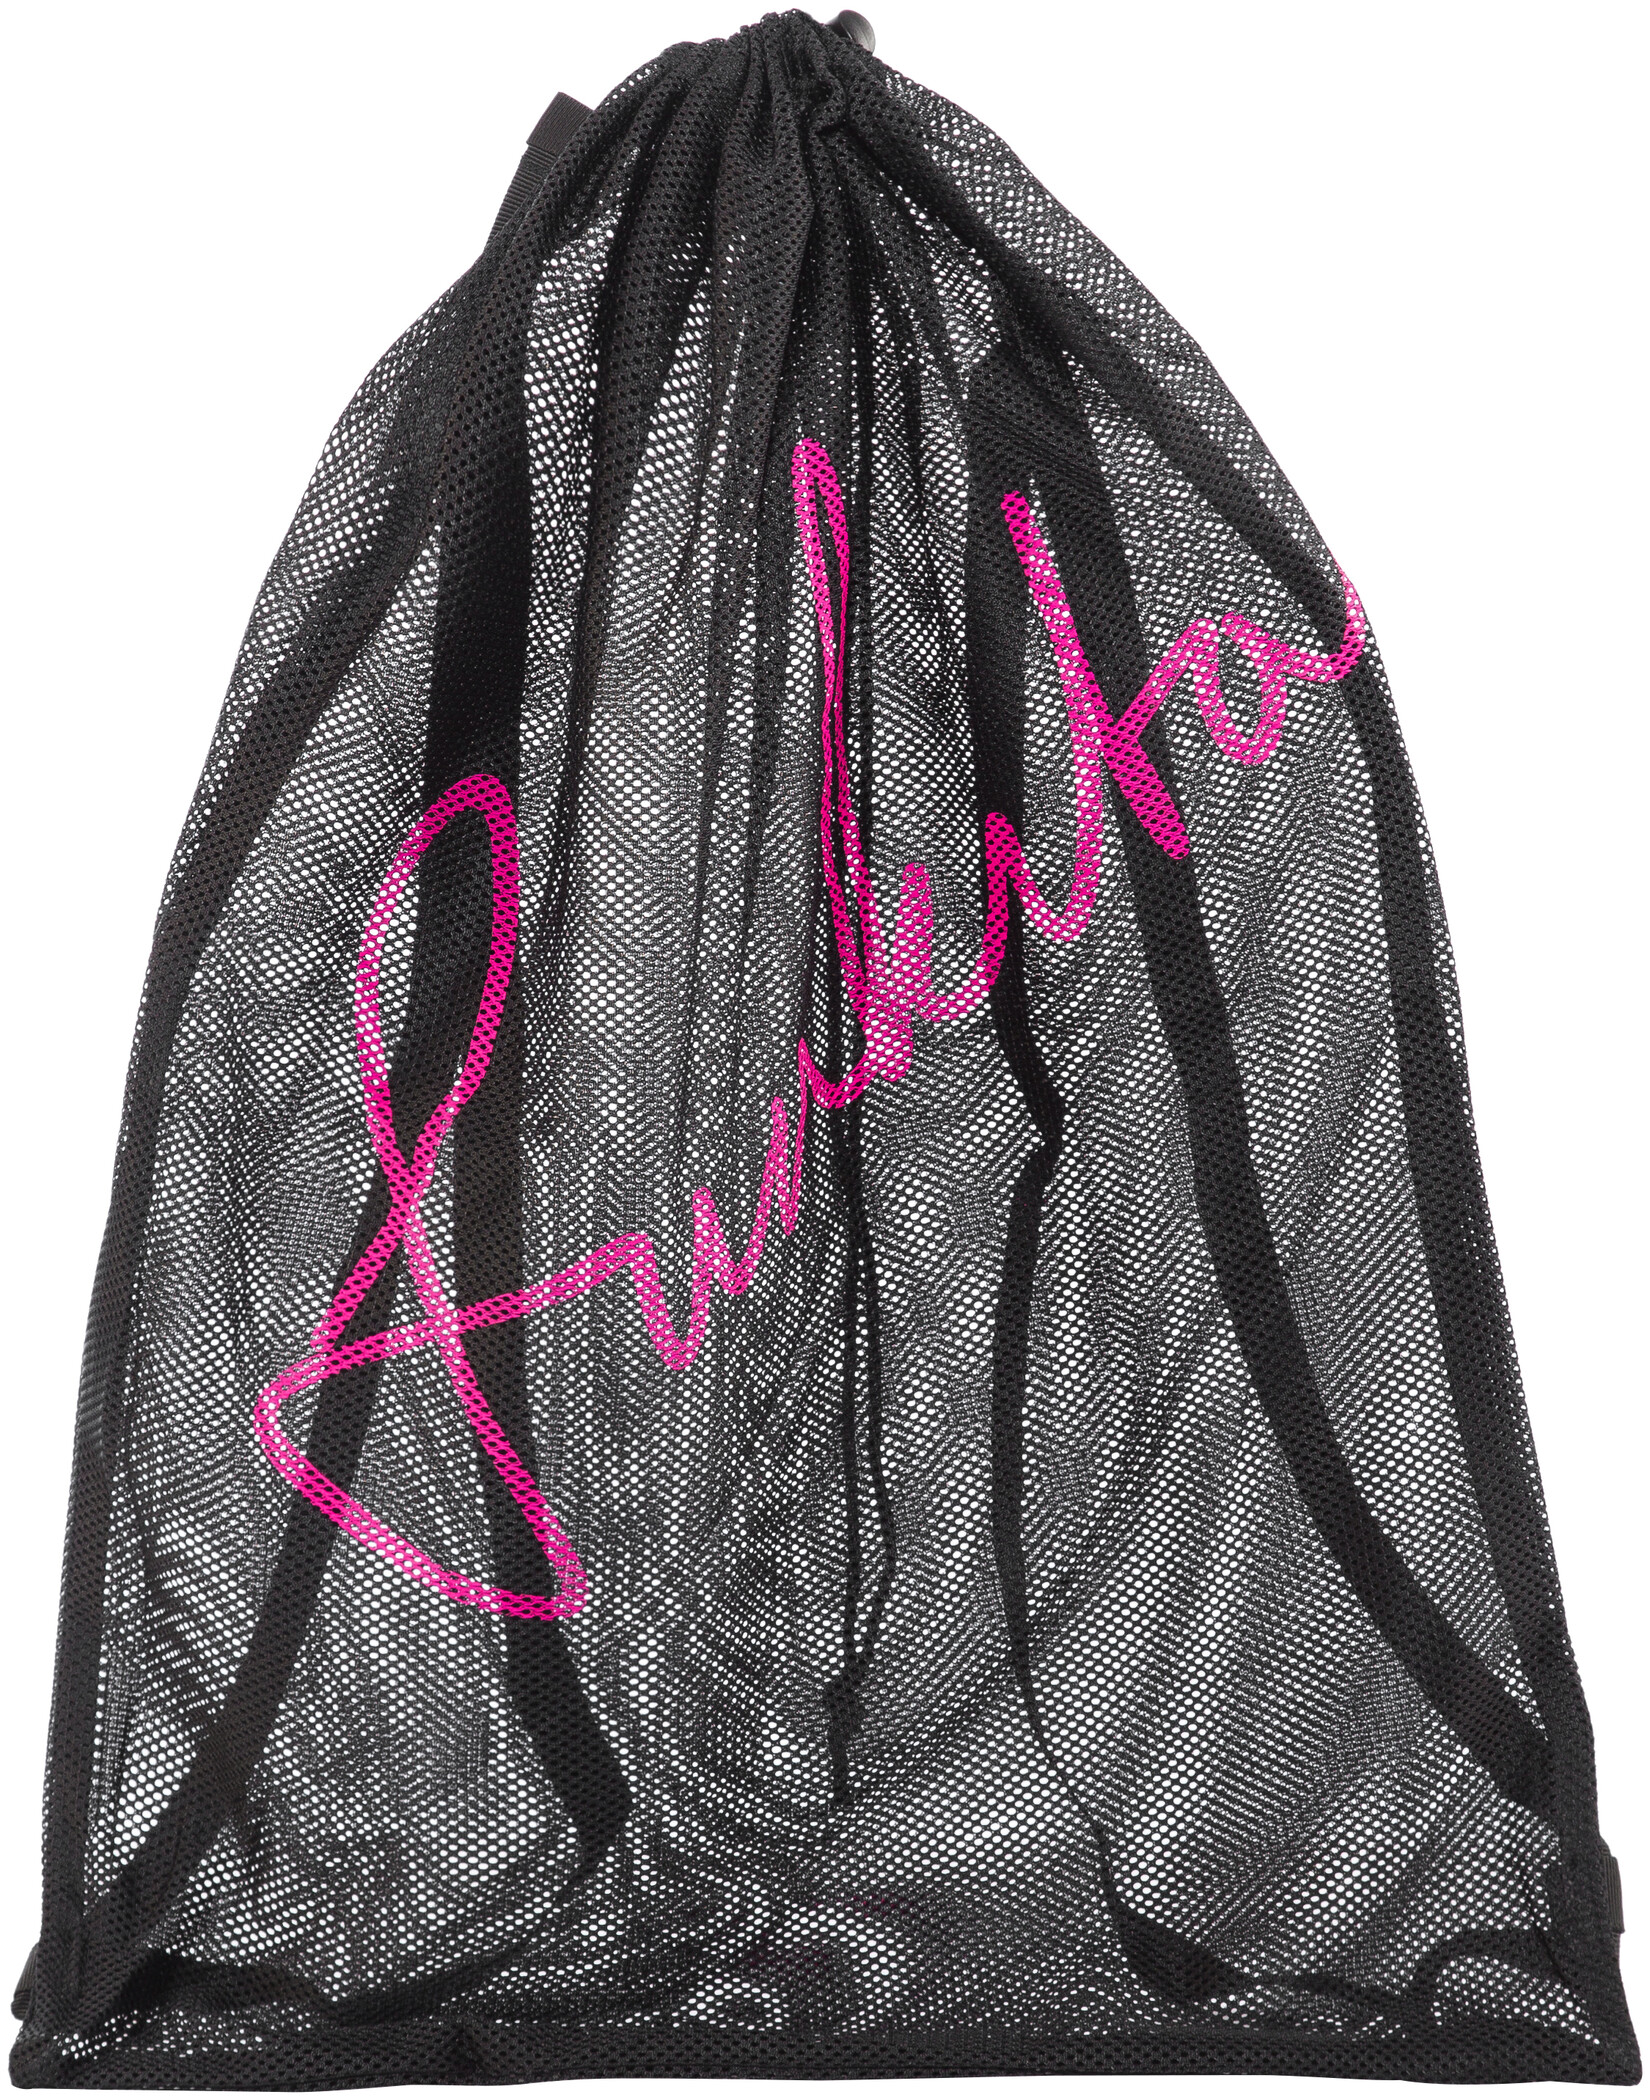 Funkita Mesh Gear Bag, still black (2019) | Travel bags